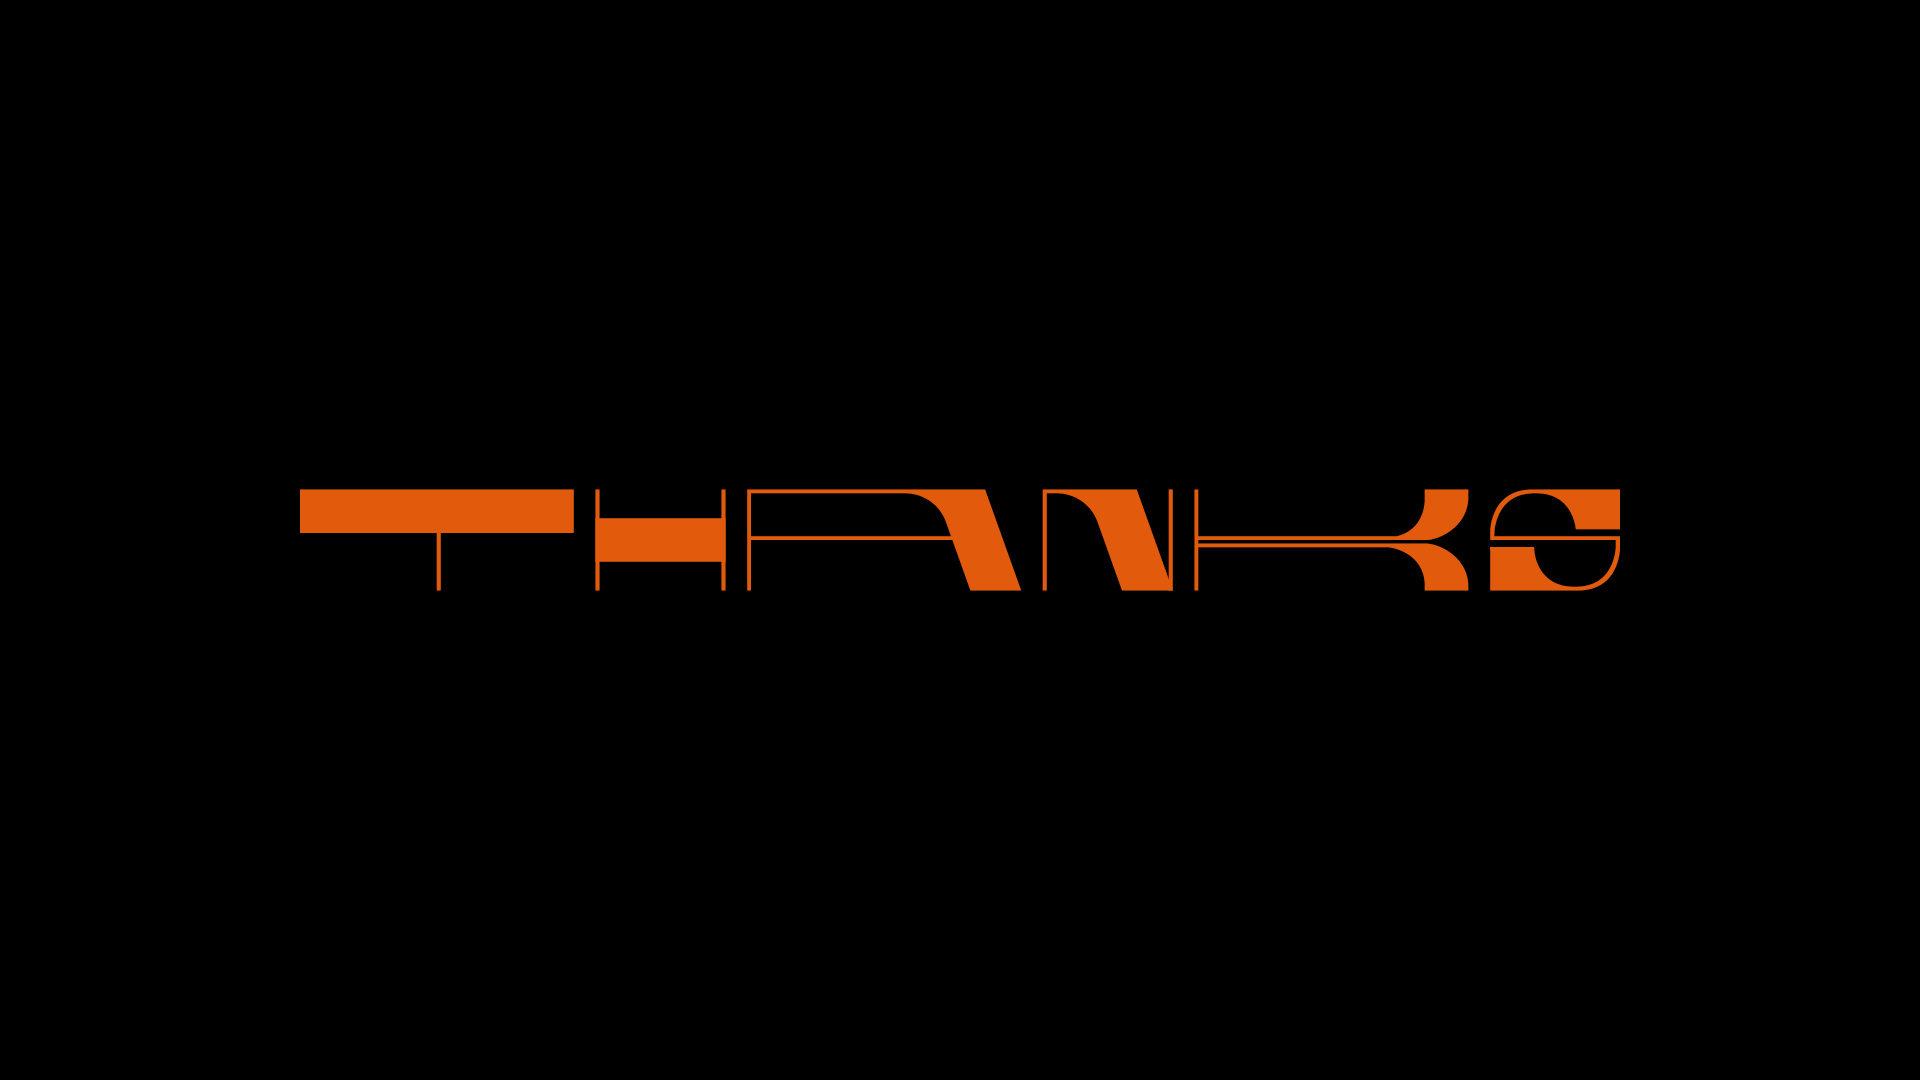 Flexnar typeface orange on black background